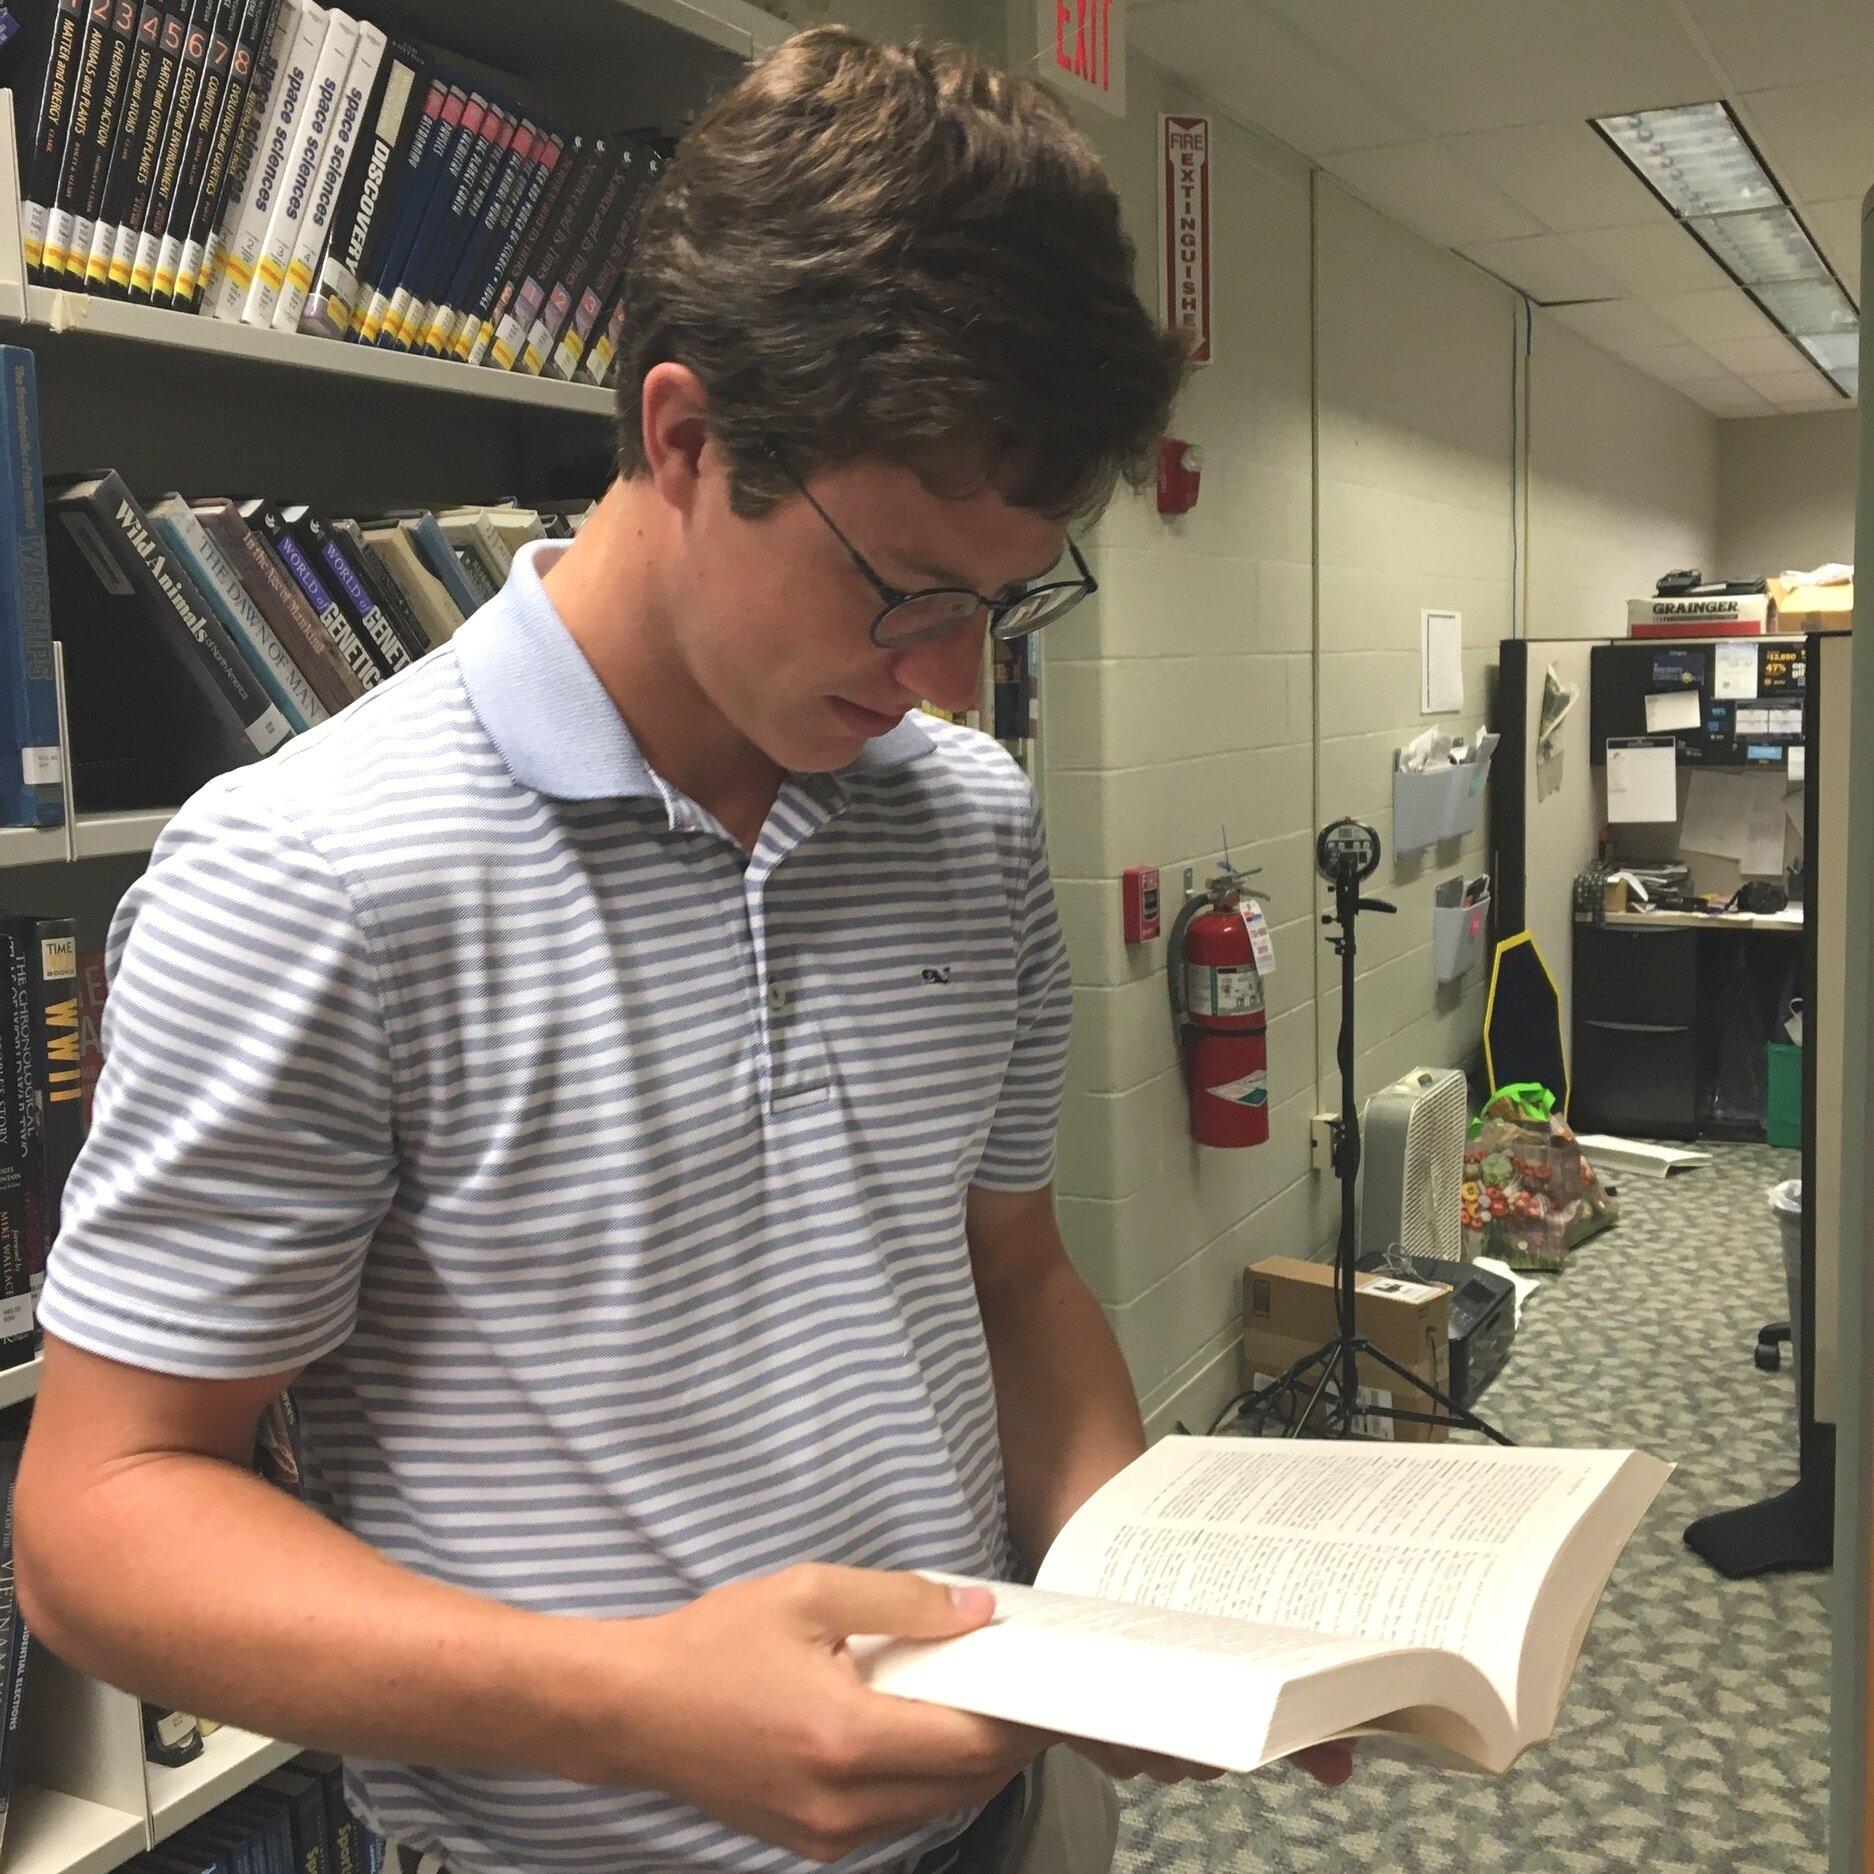 Senior captain Michael Currin deep in his studies  by Jack land